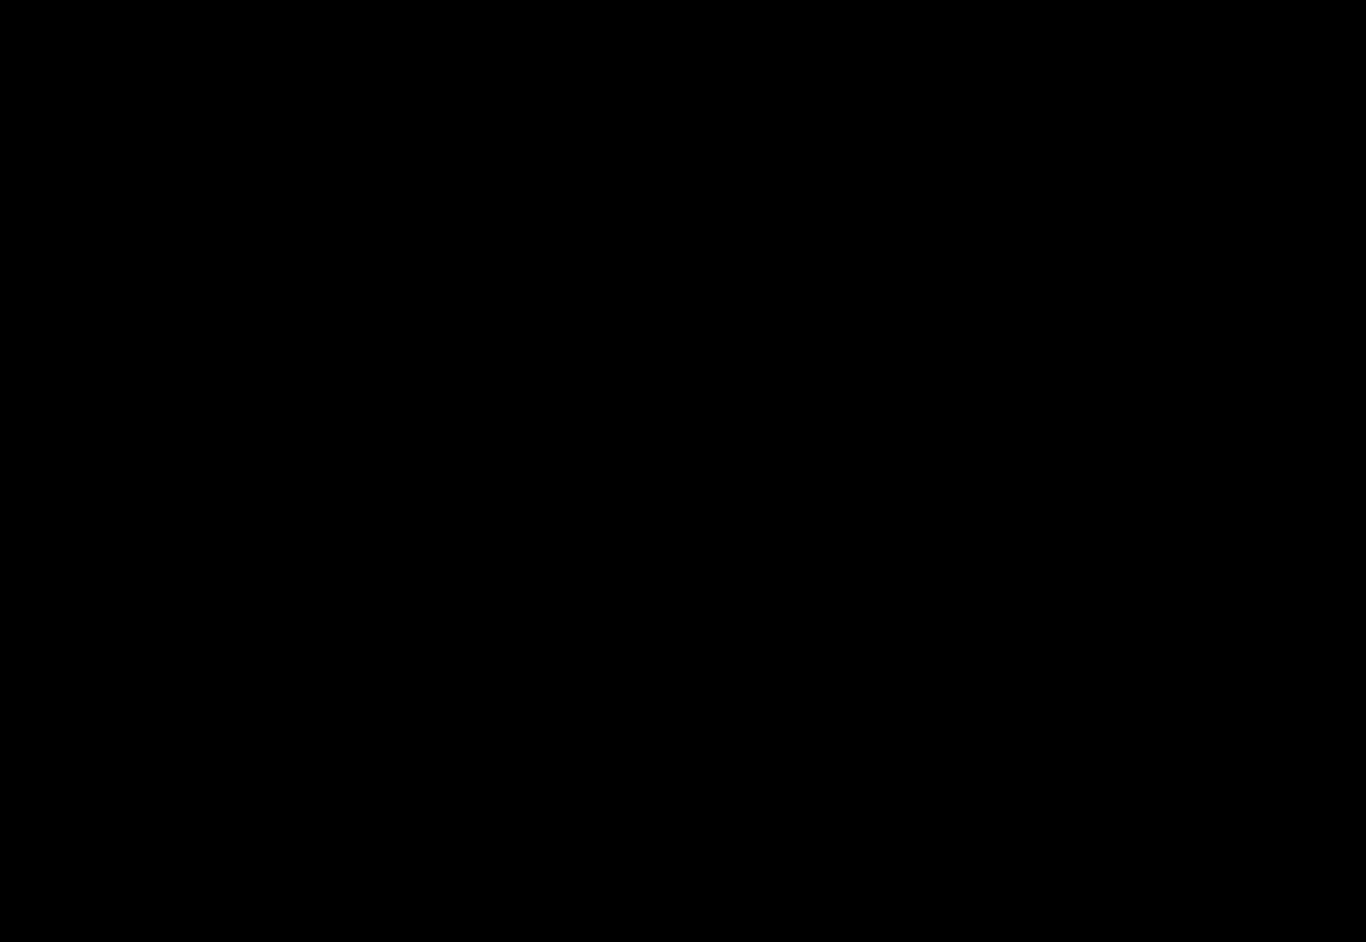 Amino-dPEG®₄-(m-dPEG®₁₂)₃